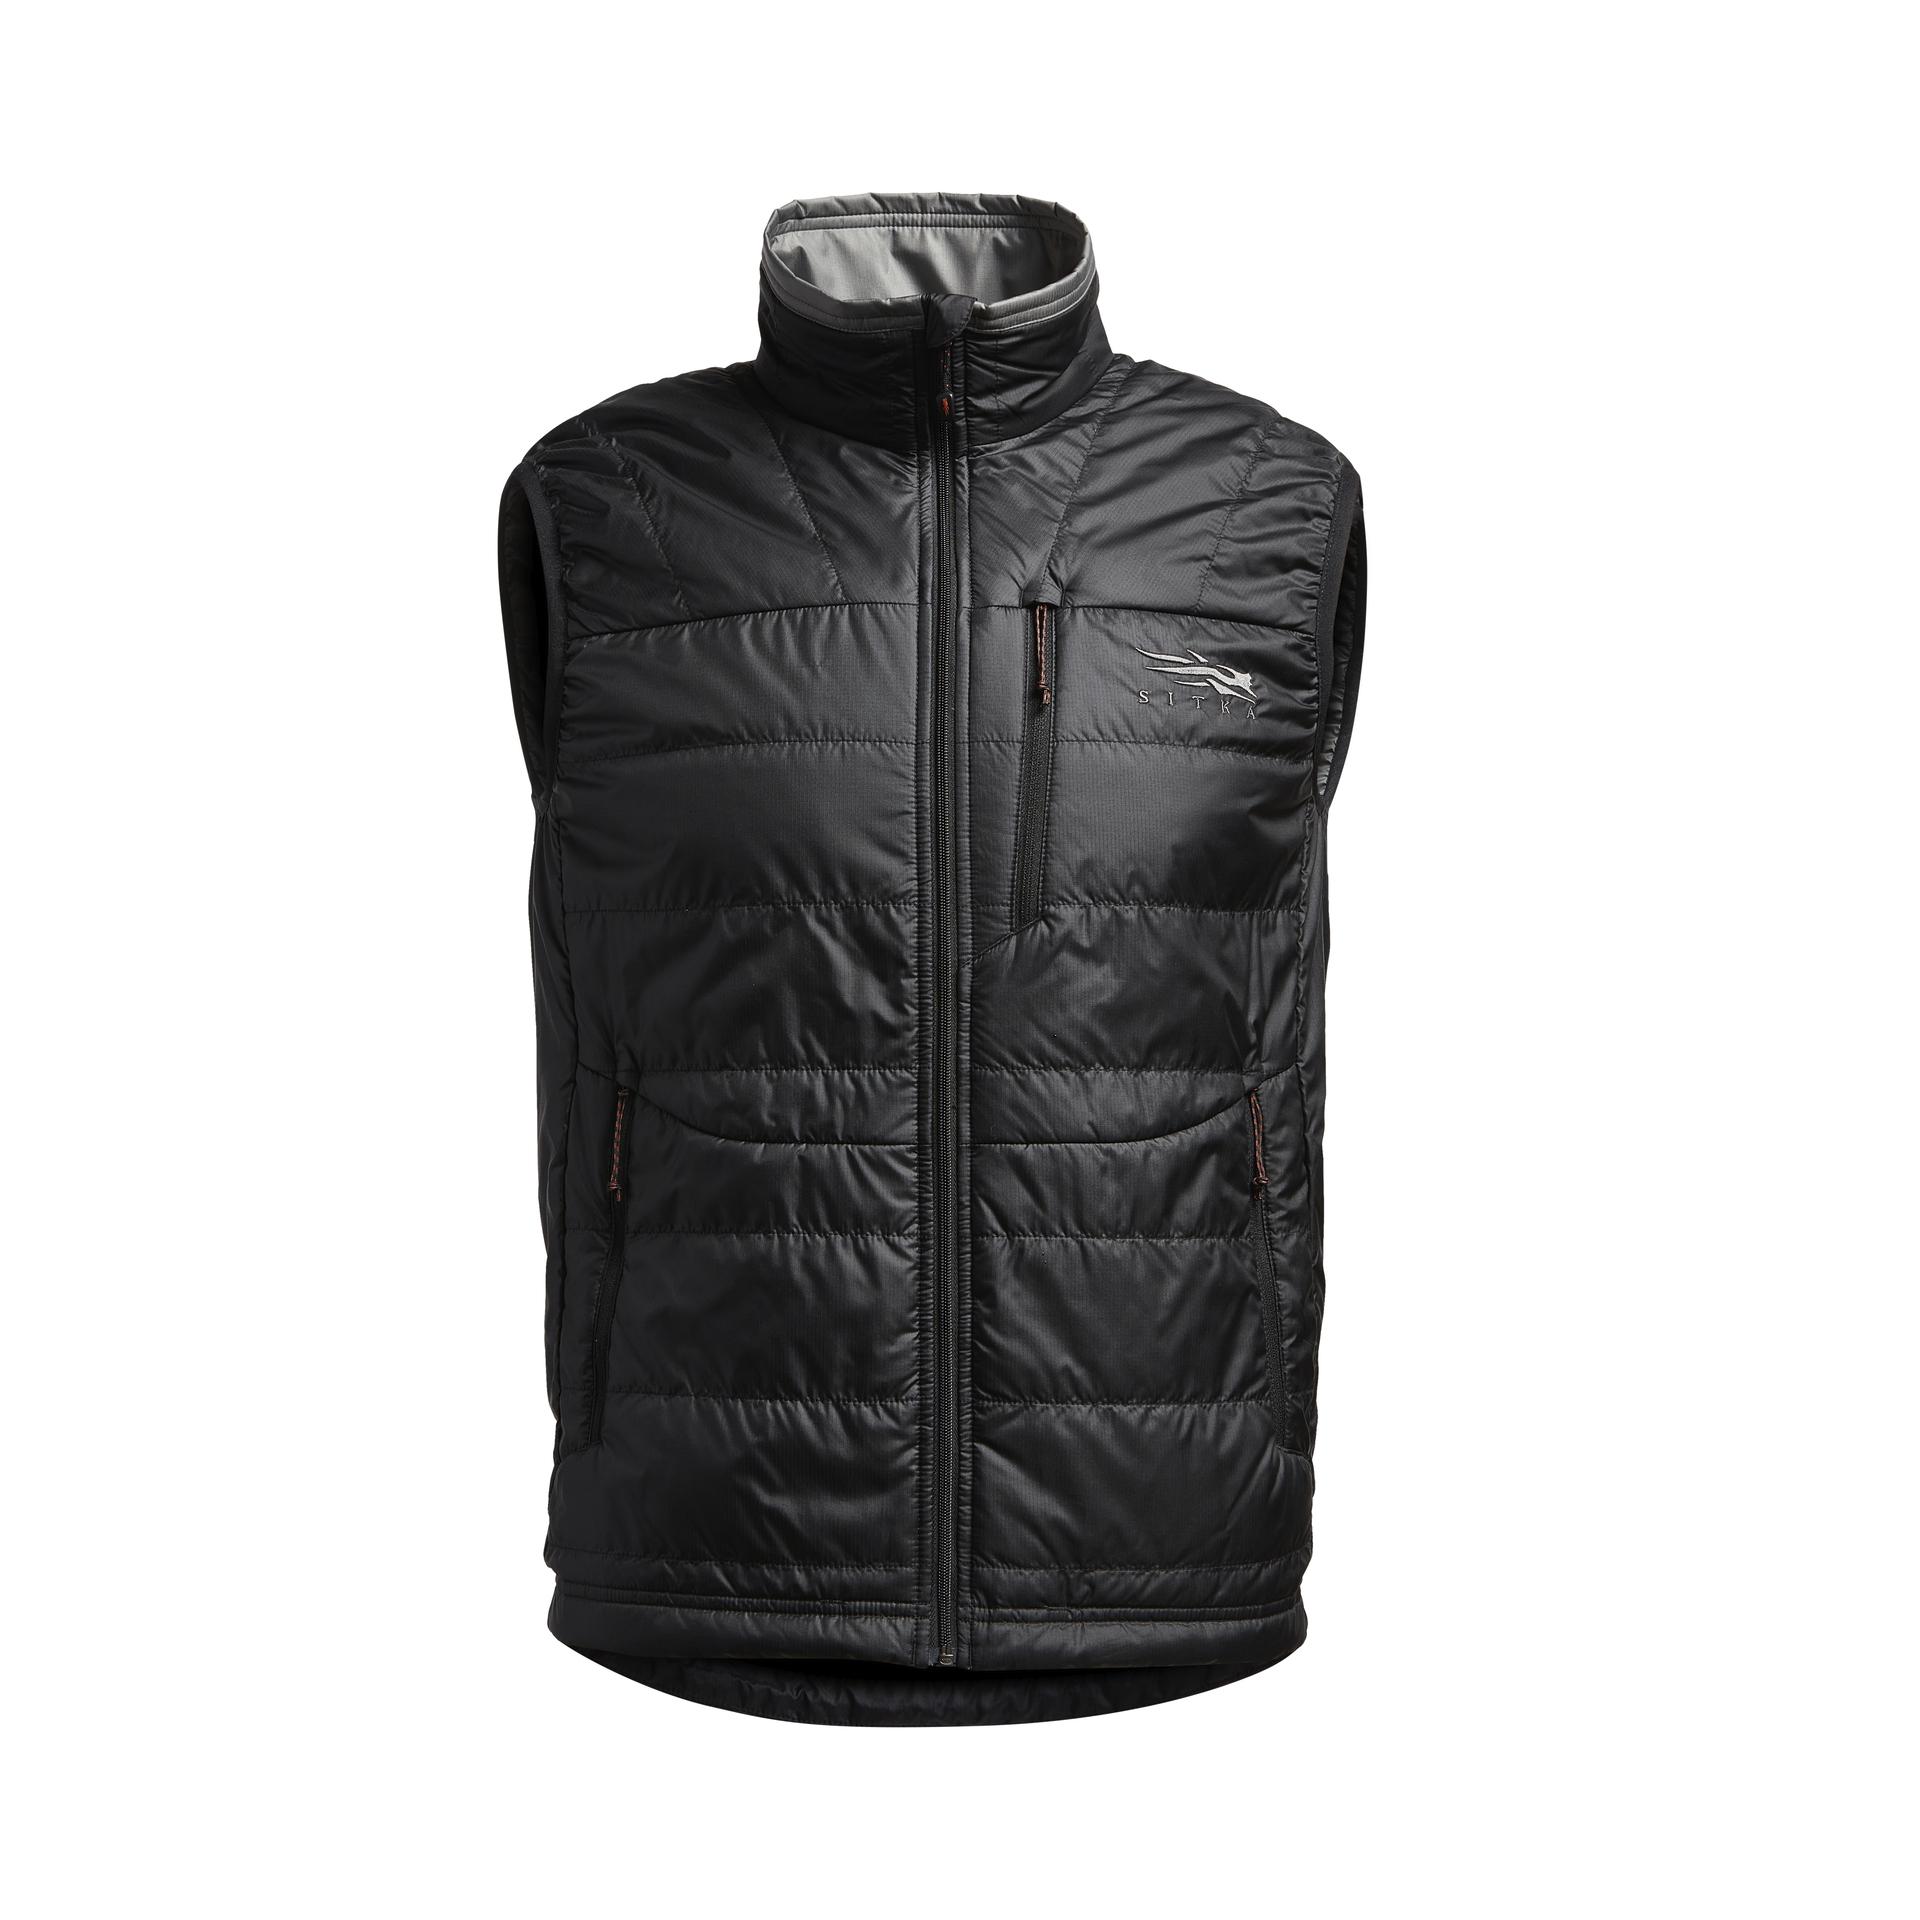 Sitka Gear - Kelvin Aerolite Vest Black